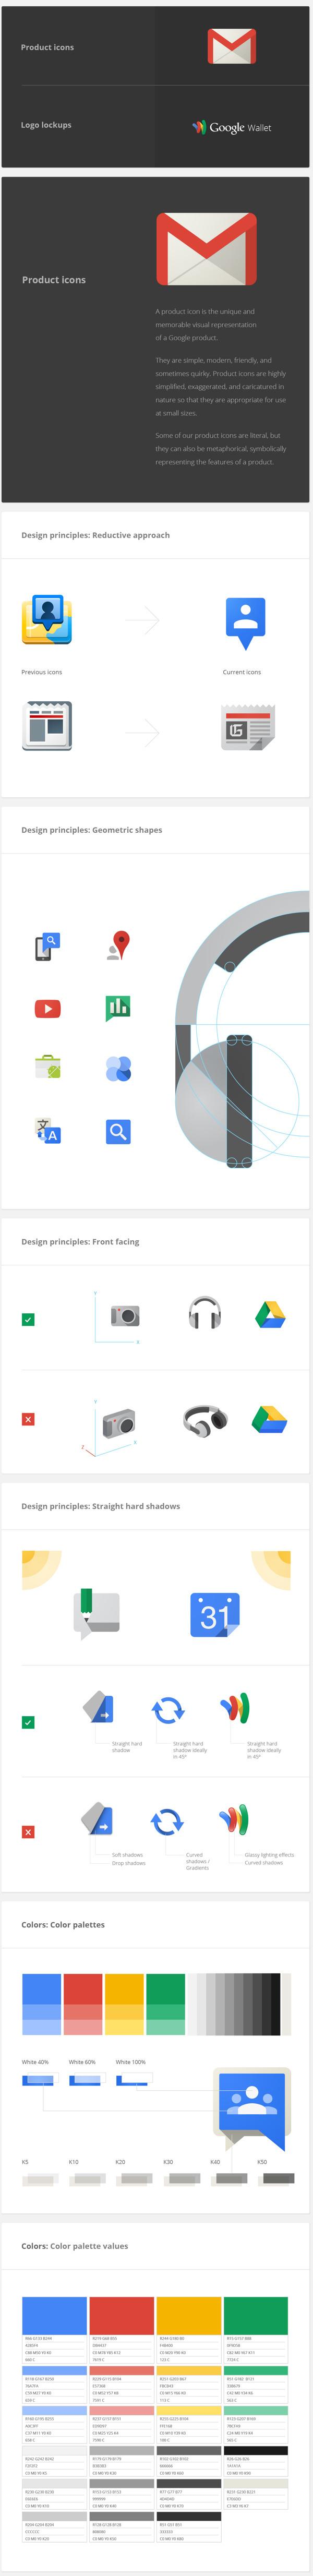 Google Visual Assets Guidelines Part 1 on Behance #google